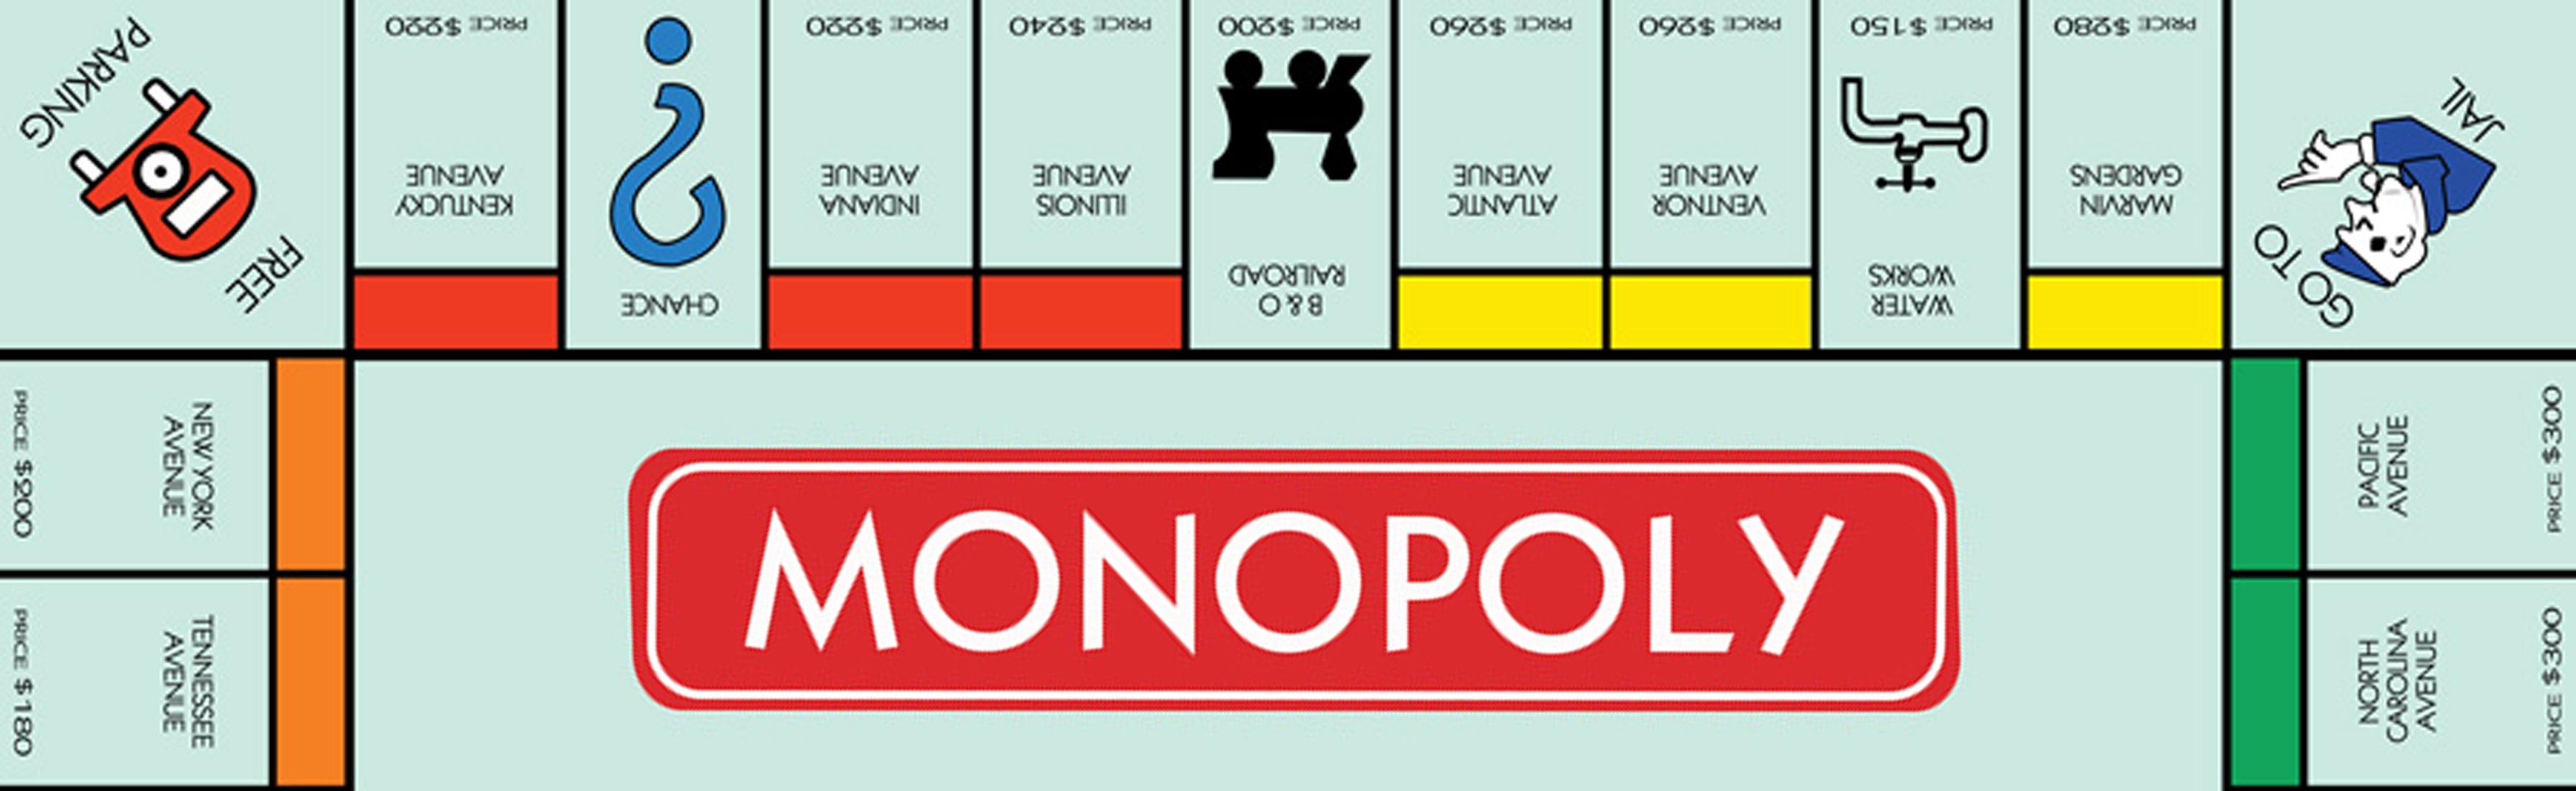 Monopoly Board Pub Crawl  Raiders of the Lost Pubs